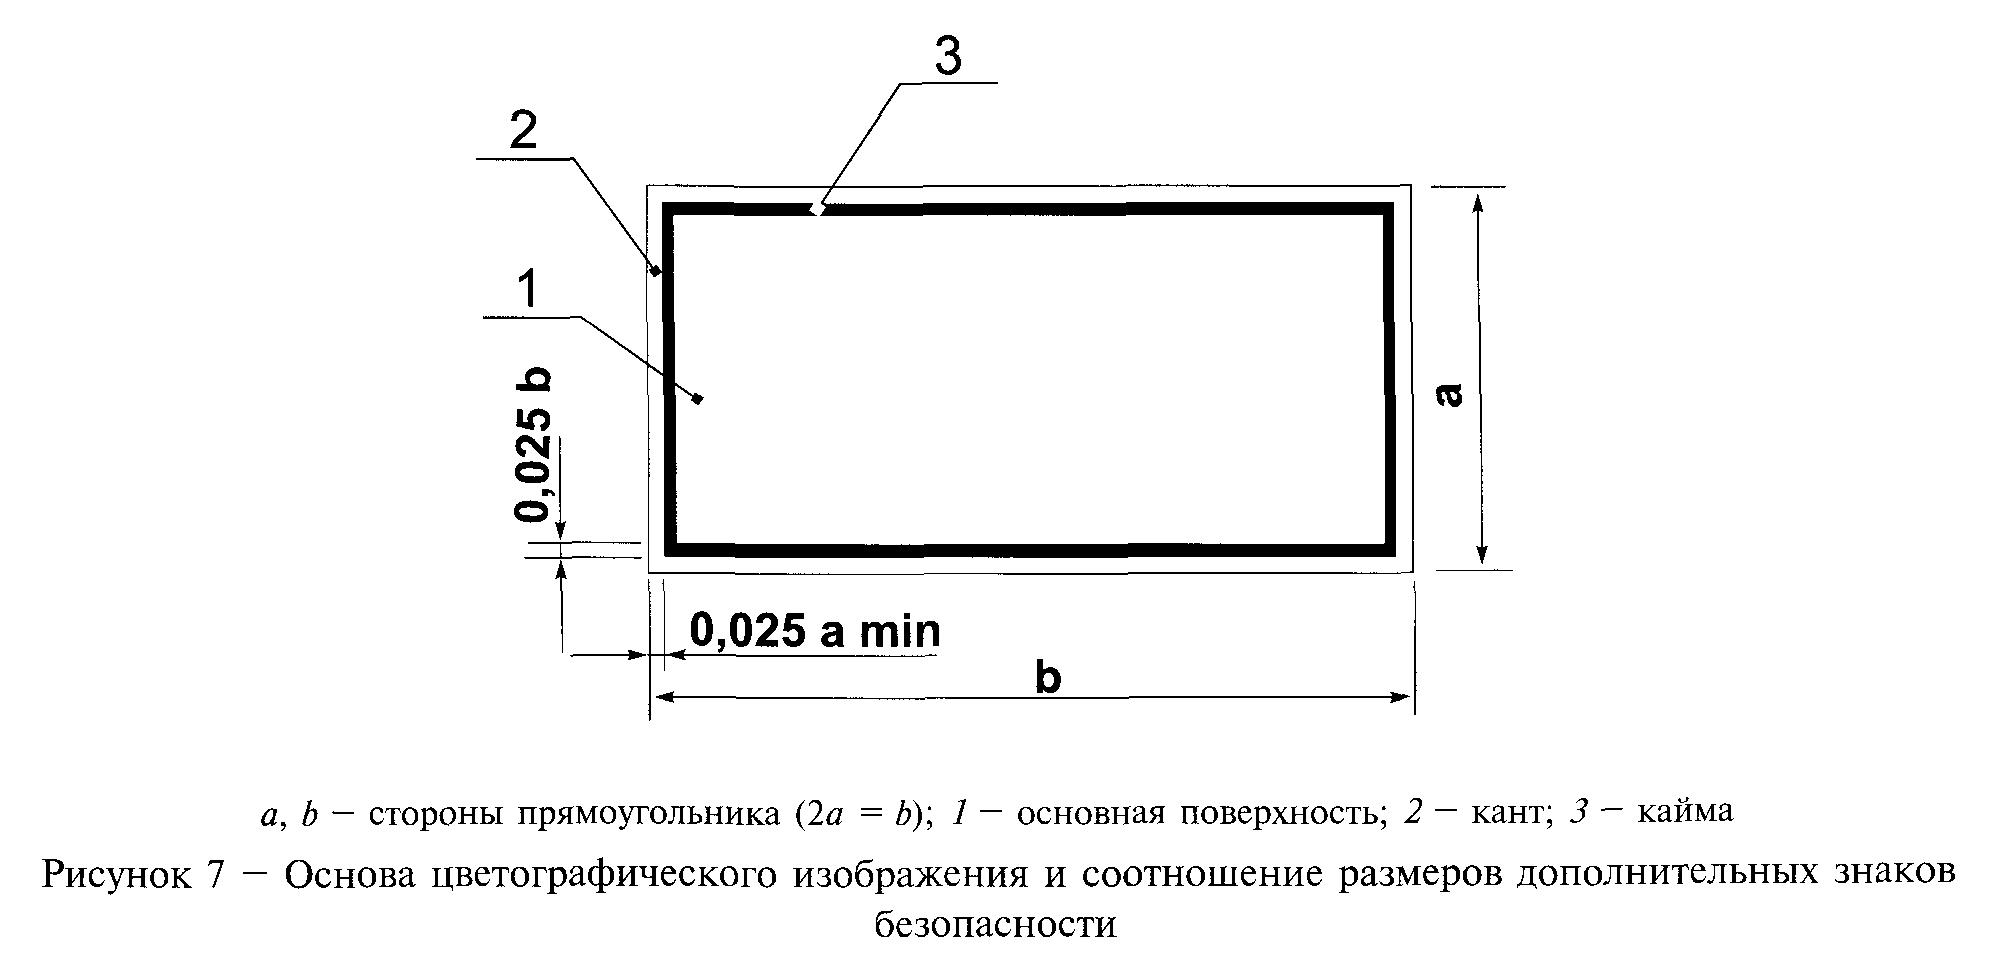 РИСУНОК 7. К ГОСТ Р 12.4.026-2001